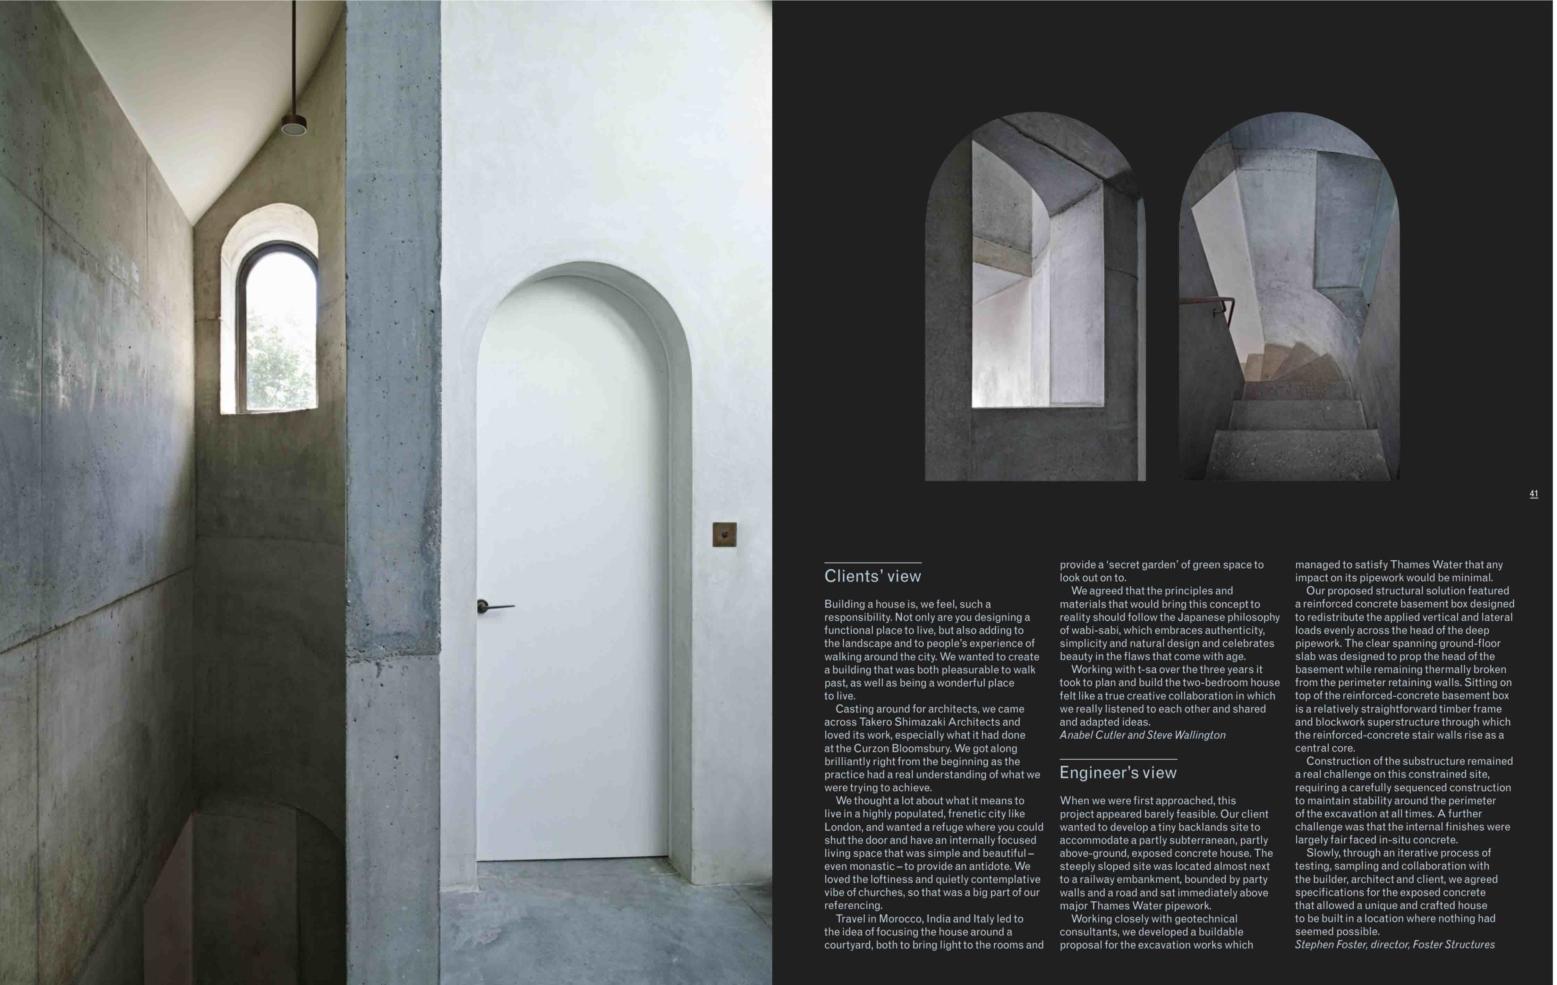 t-sa_Tiverton_Architects Journal_04